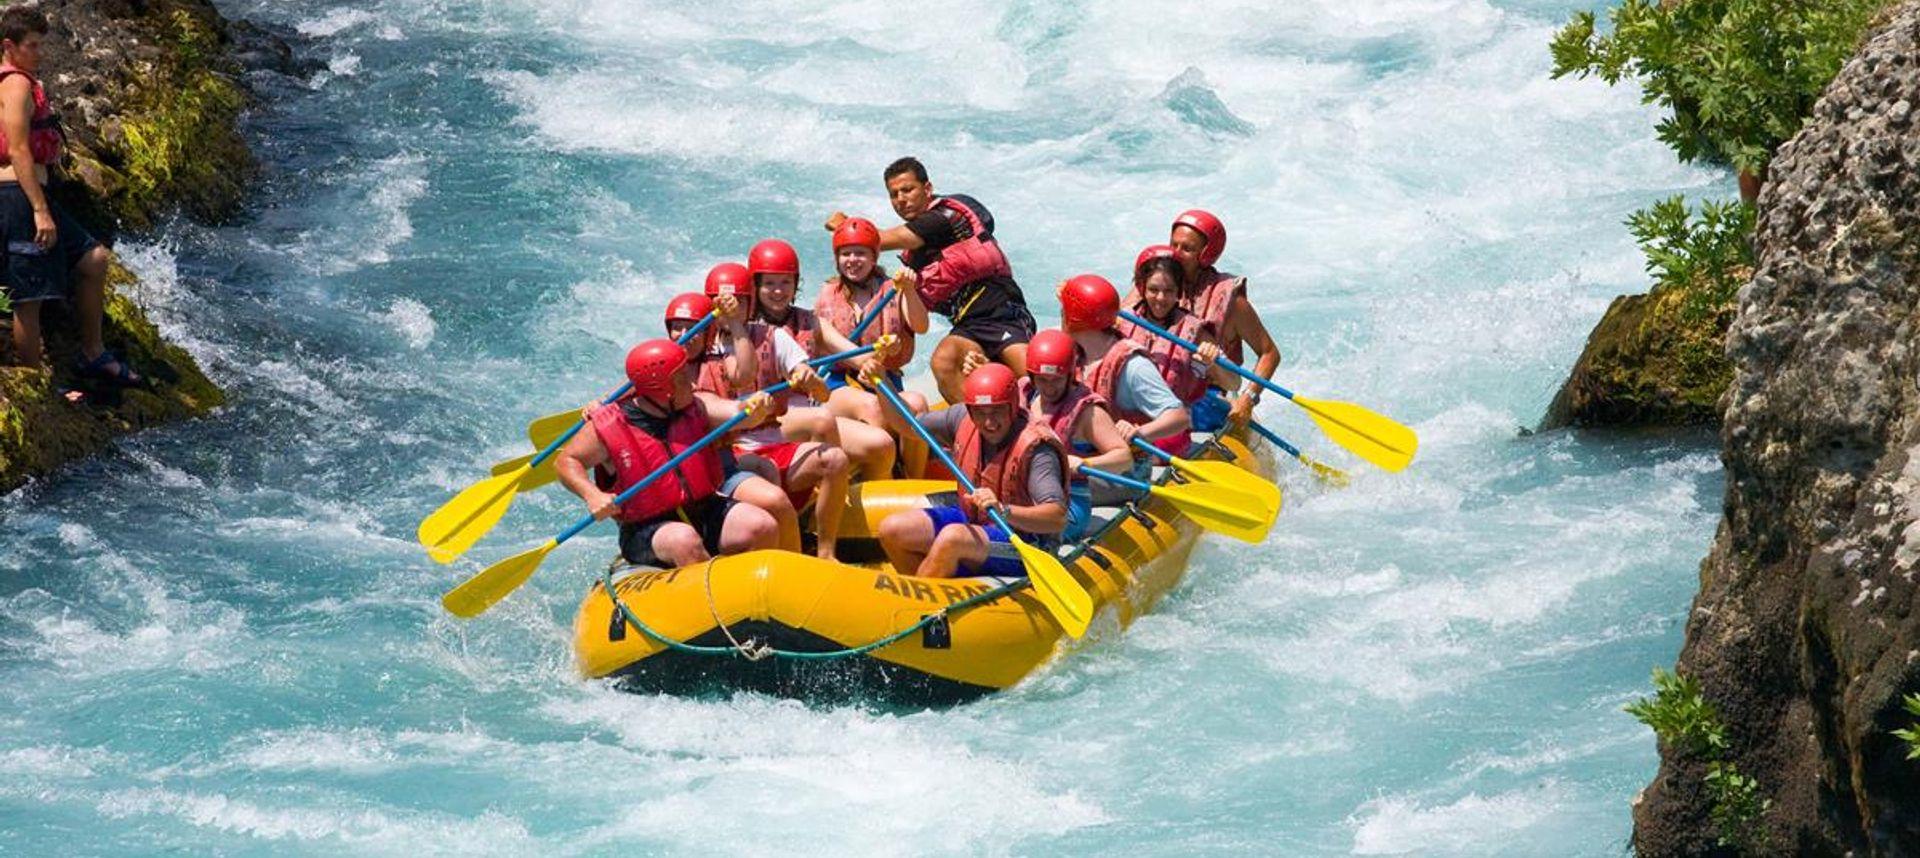 White water rafting in Switzerland (www.swiss-image.ch)